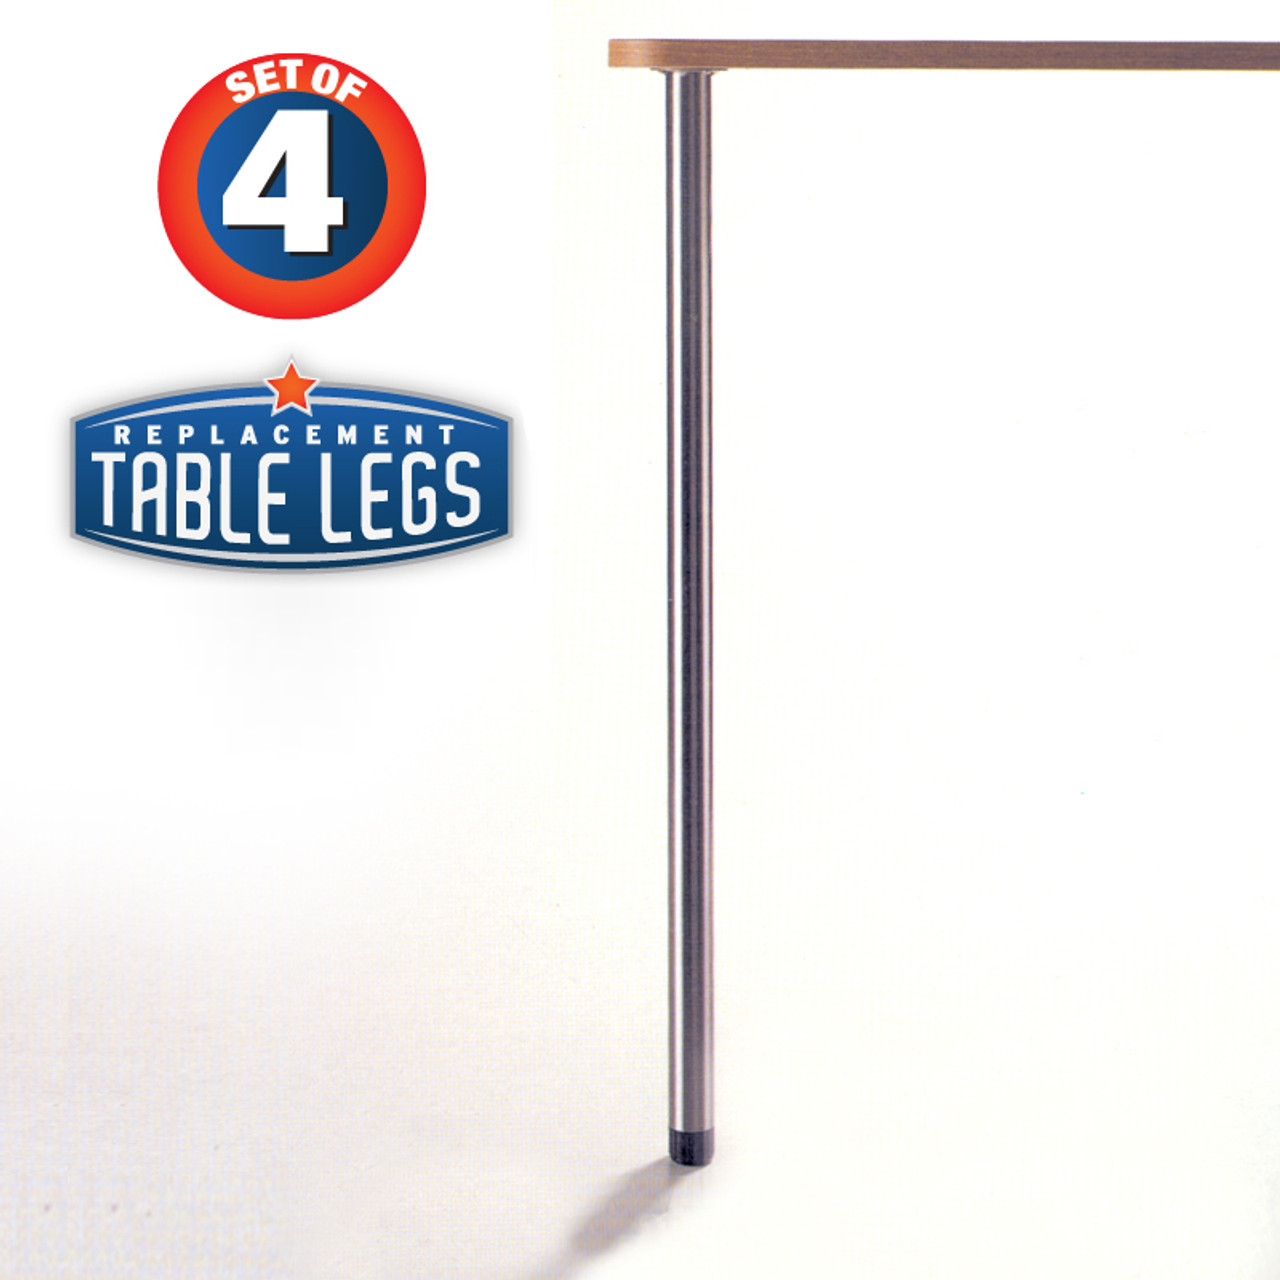 "Slim Table Legs, 27-3/4"" table height, 1-3/8"" diameter, 1"" adjustable foot, chrome - replacementtablelegs.com"